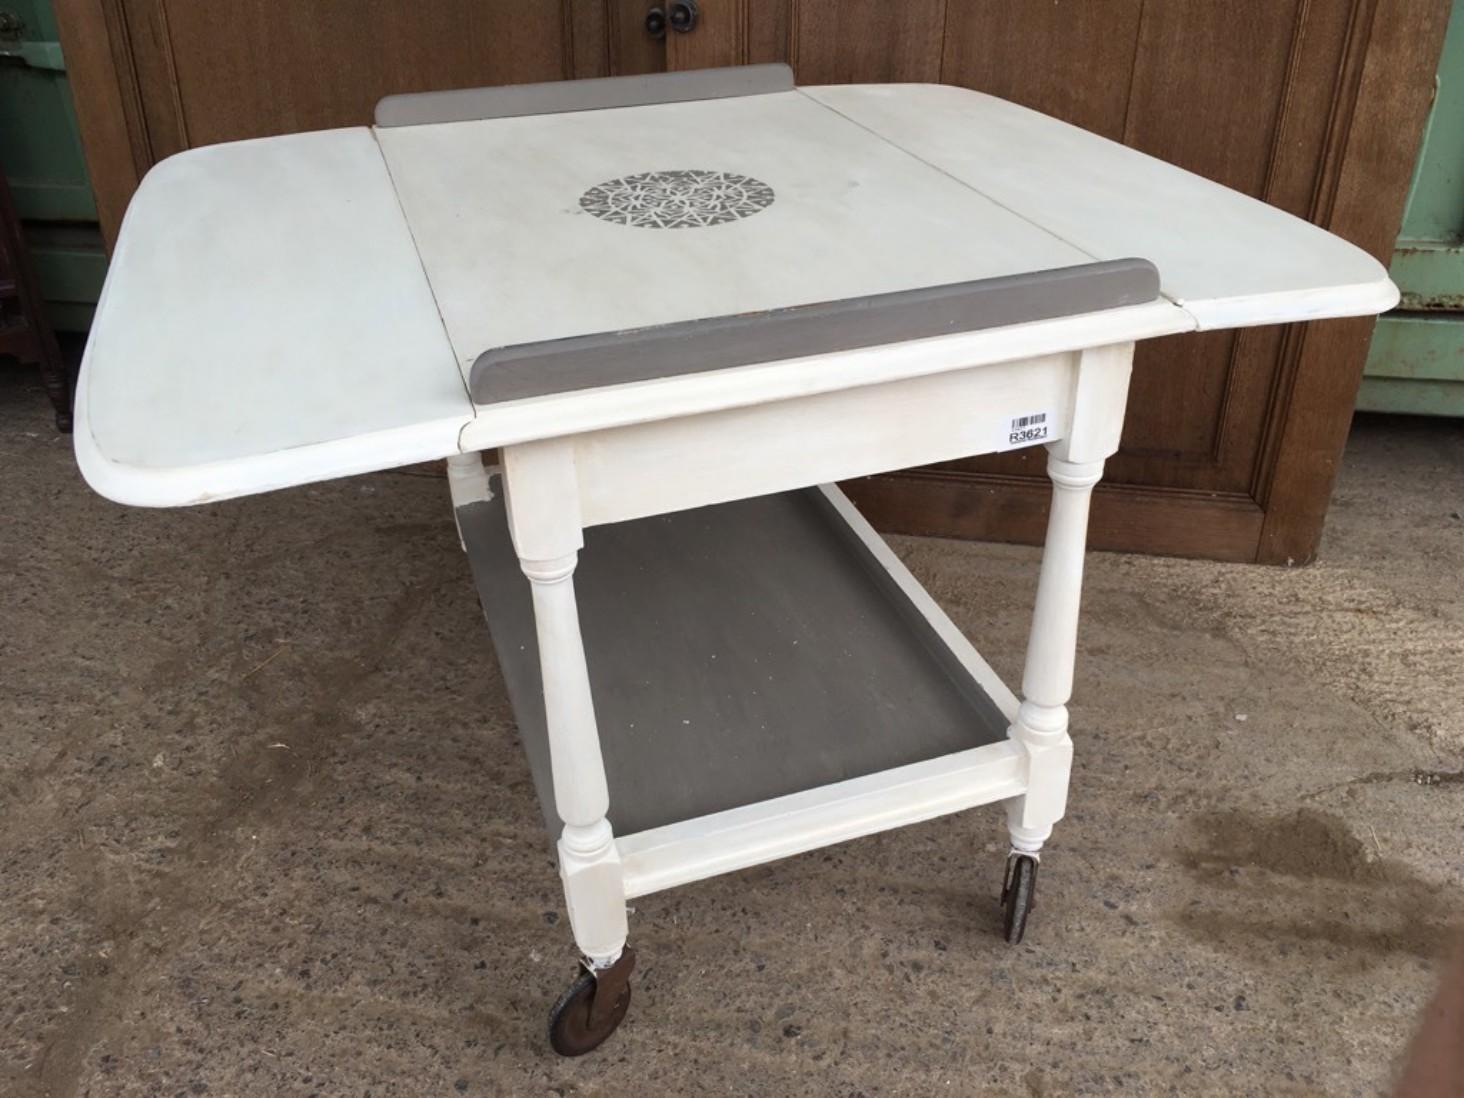 Trolley Coffee Table.Interesting 1930s Oak Painted Drop Leaf Serving Trolley Coffee Table 53x81x66cm